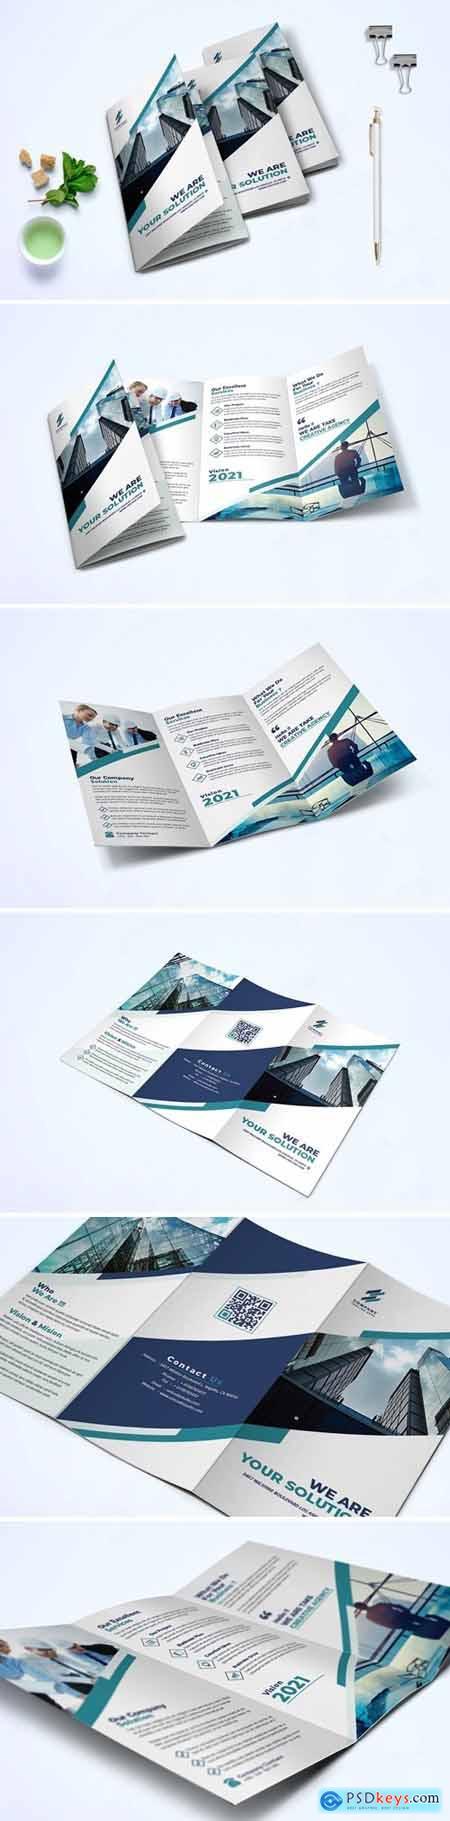 Trifold Business Brochure518 5SSF8U5